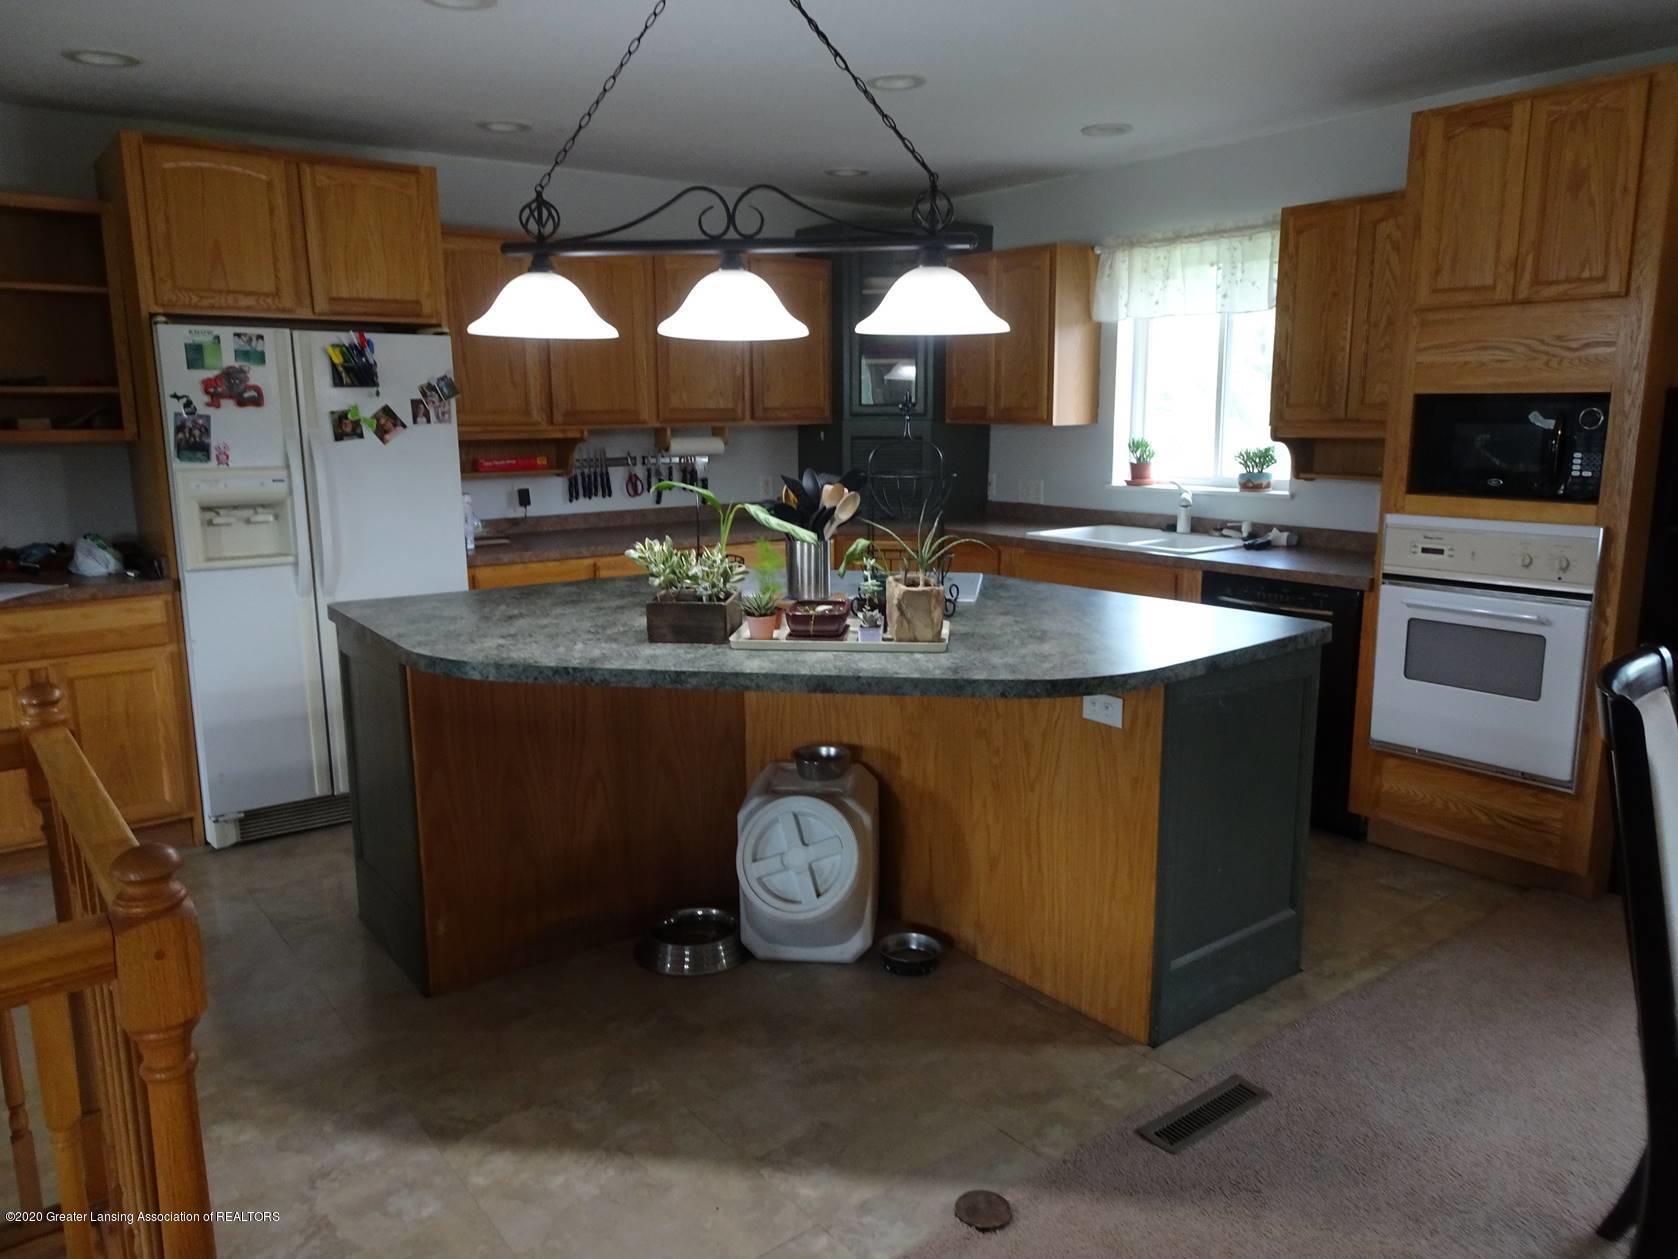 5354 N Michigan Rd - Kitchen - 2